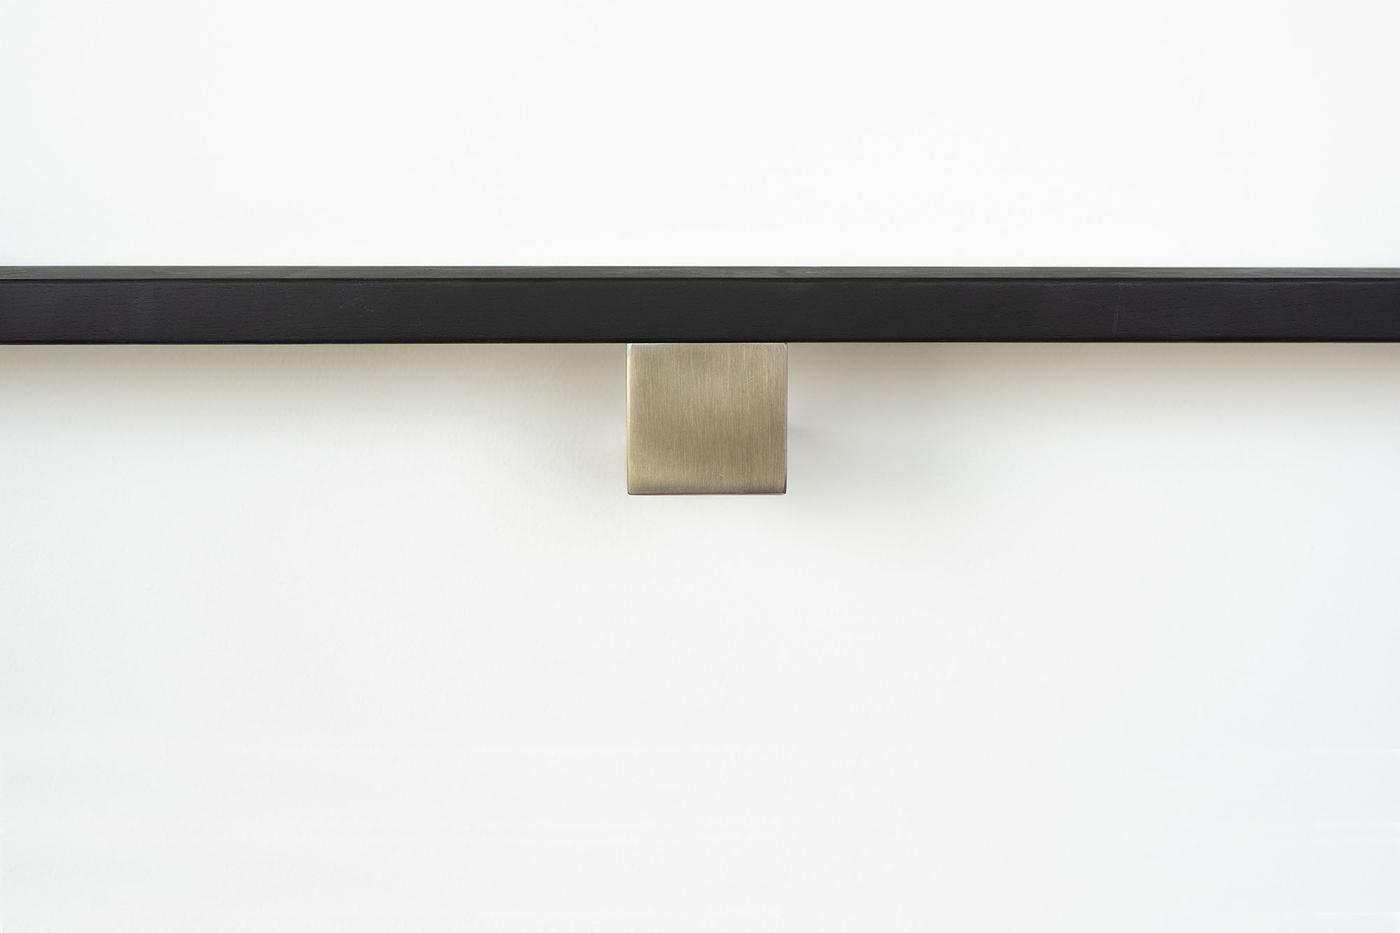 Modern-brushed-stainless-steel-handrail-brackets